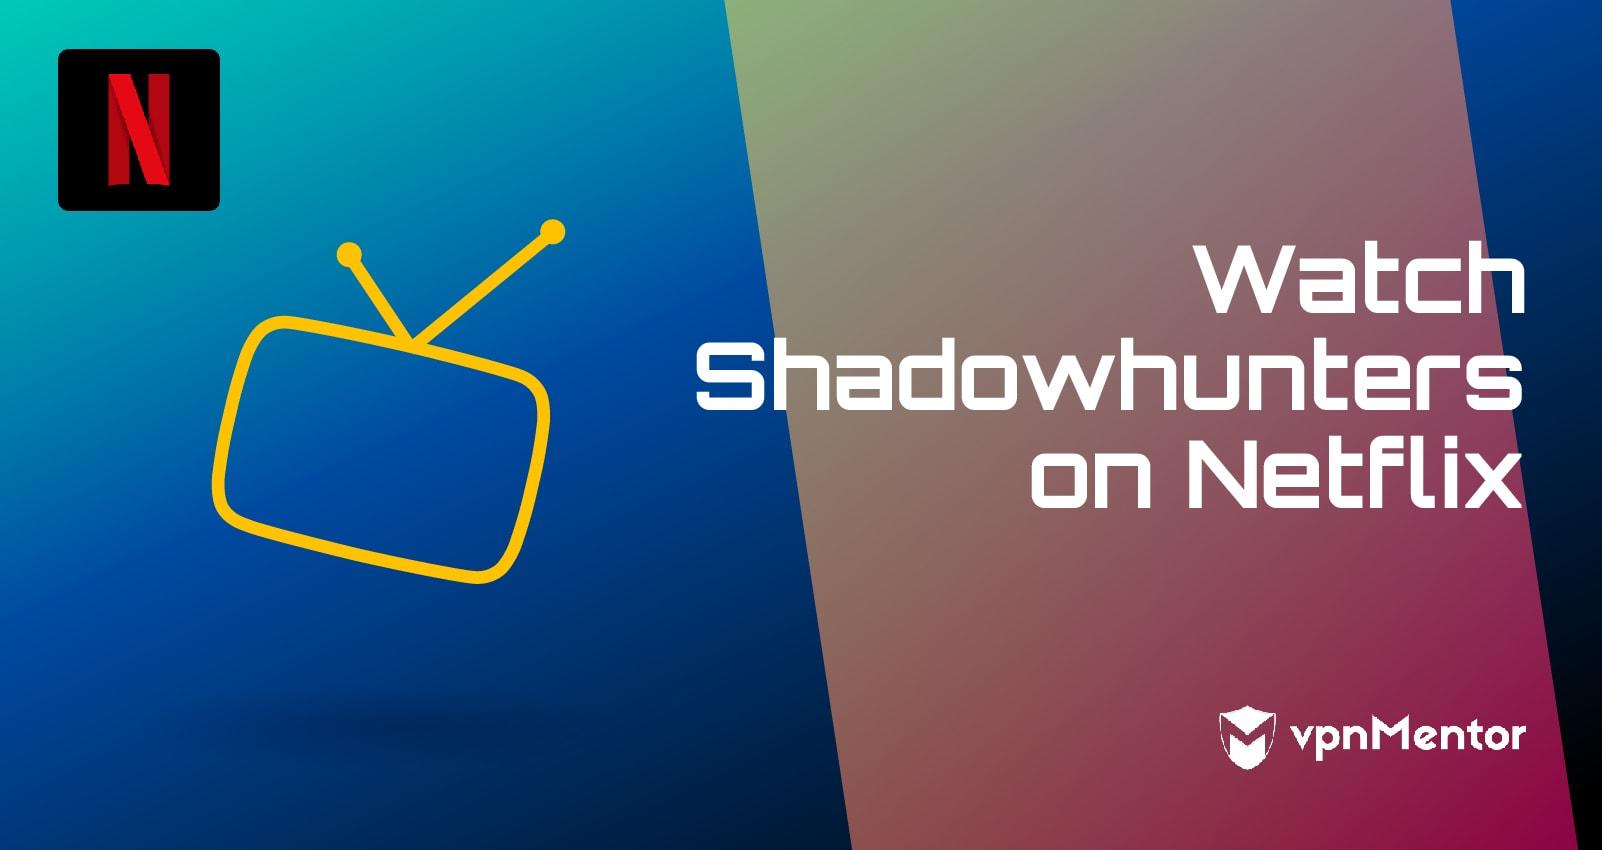 Watch Shadowhunters on Netflix